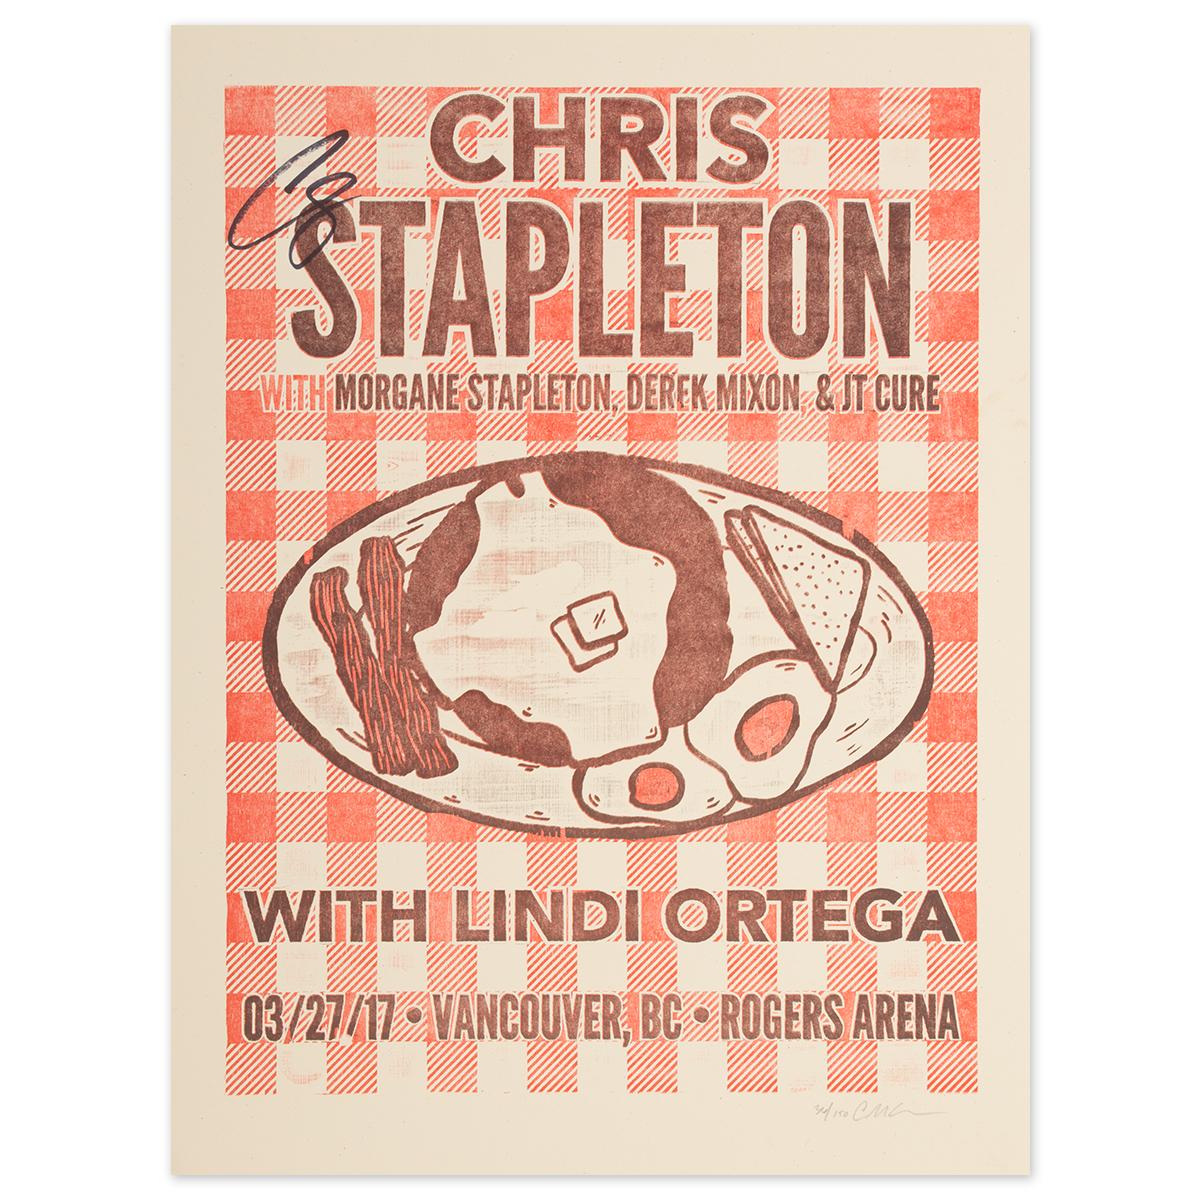 Signed Chris Stapleton Show Poster – Vancouver, British Columbia 3/27/17